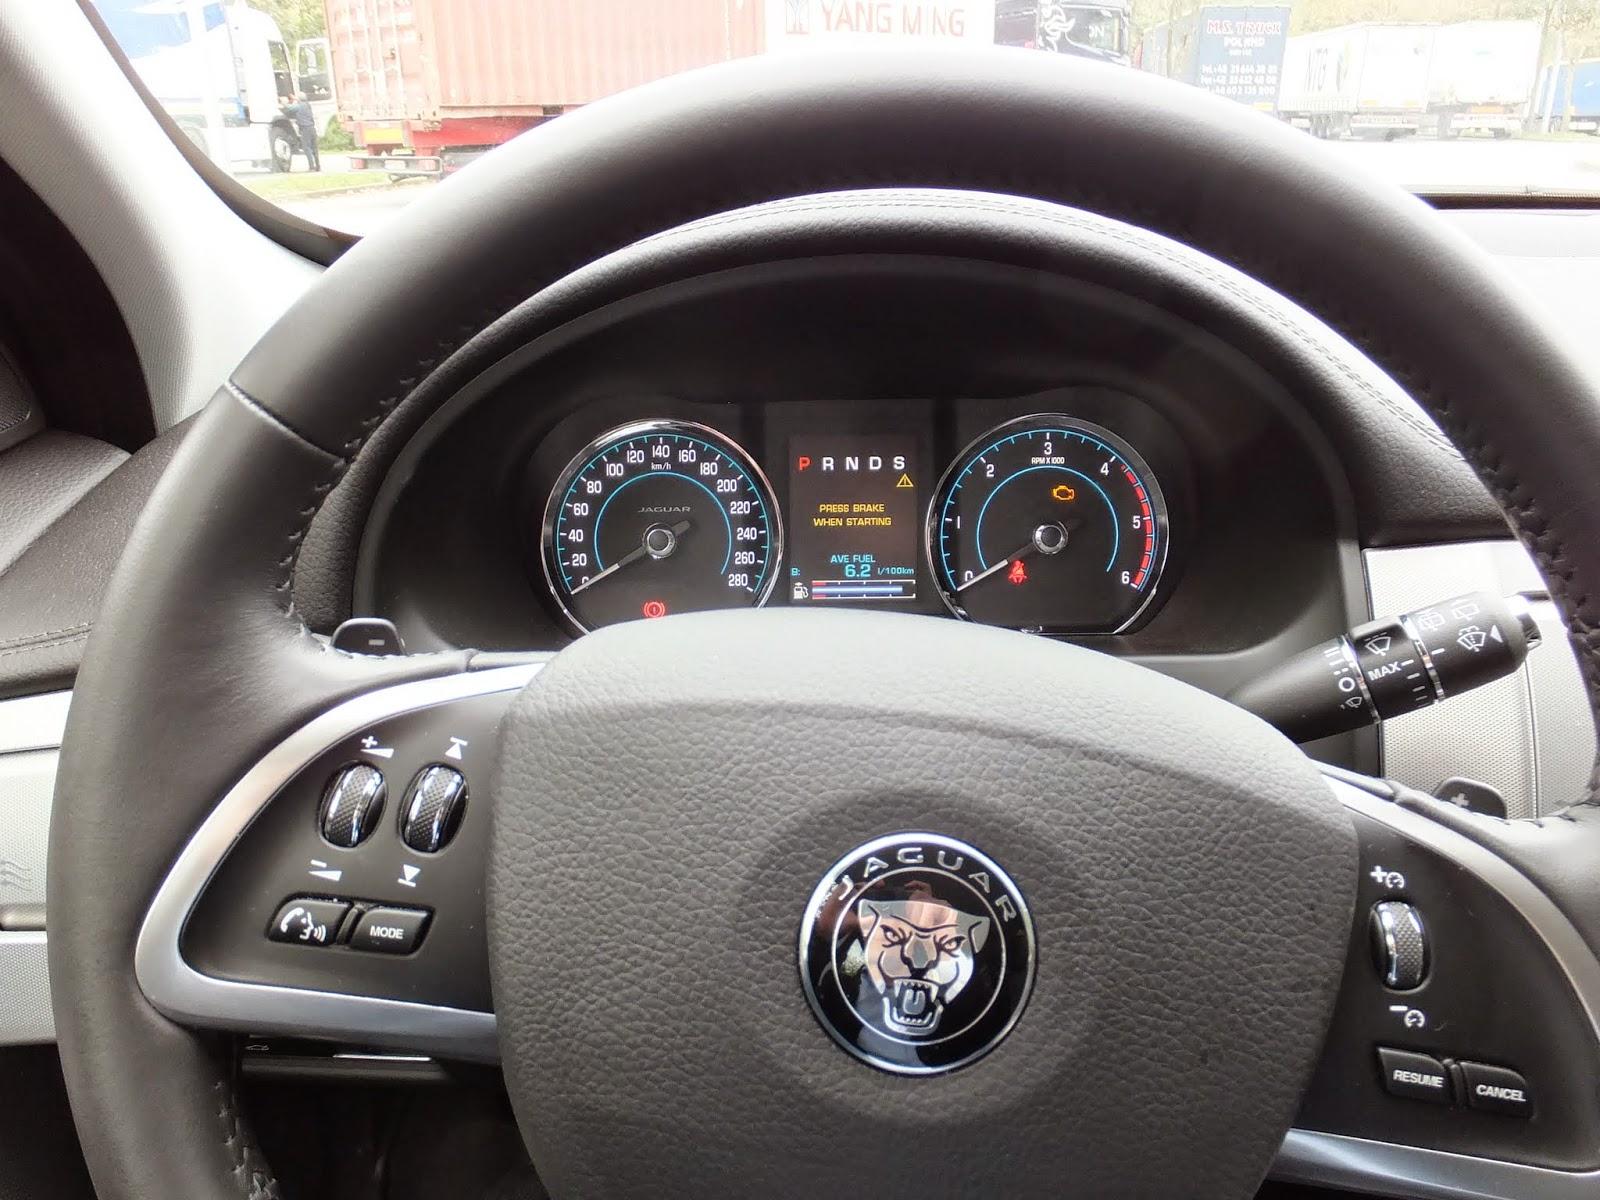 jaguar-xf-sportsbreak-steering-wheel ジャガーXFスポーツブレークのハンドル